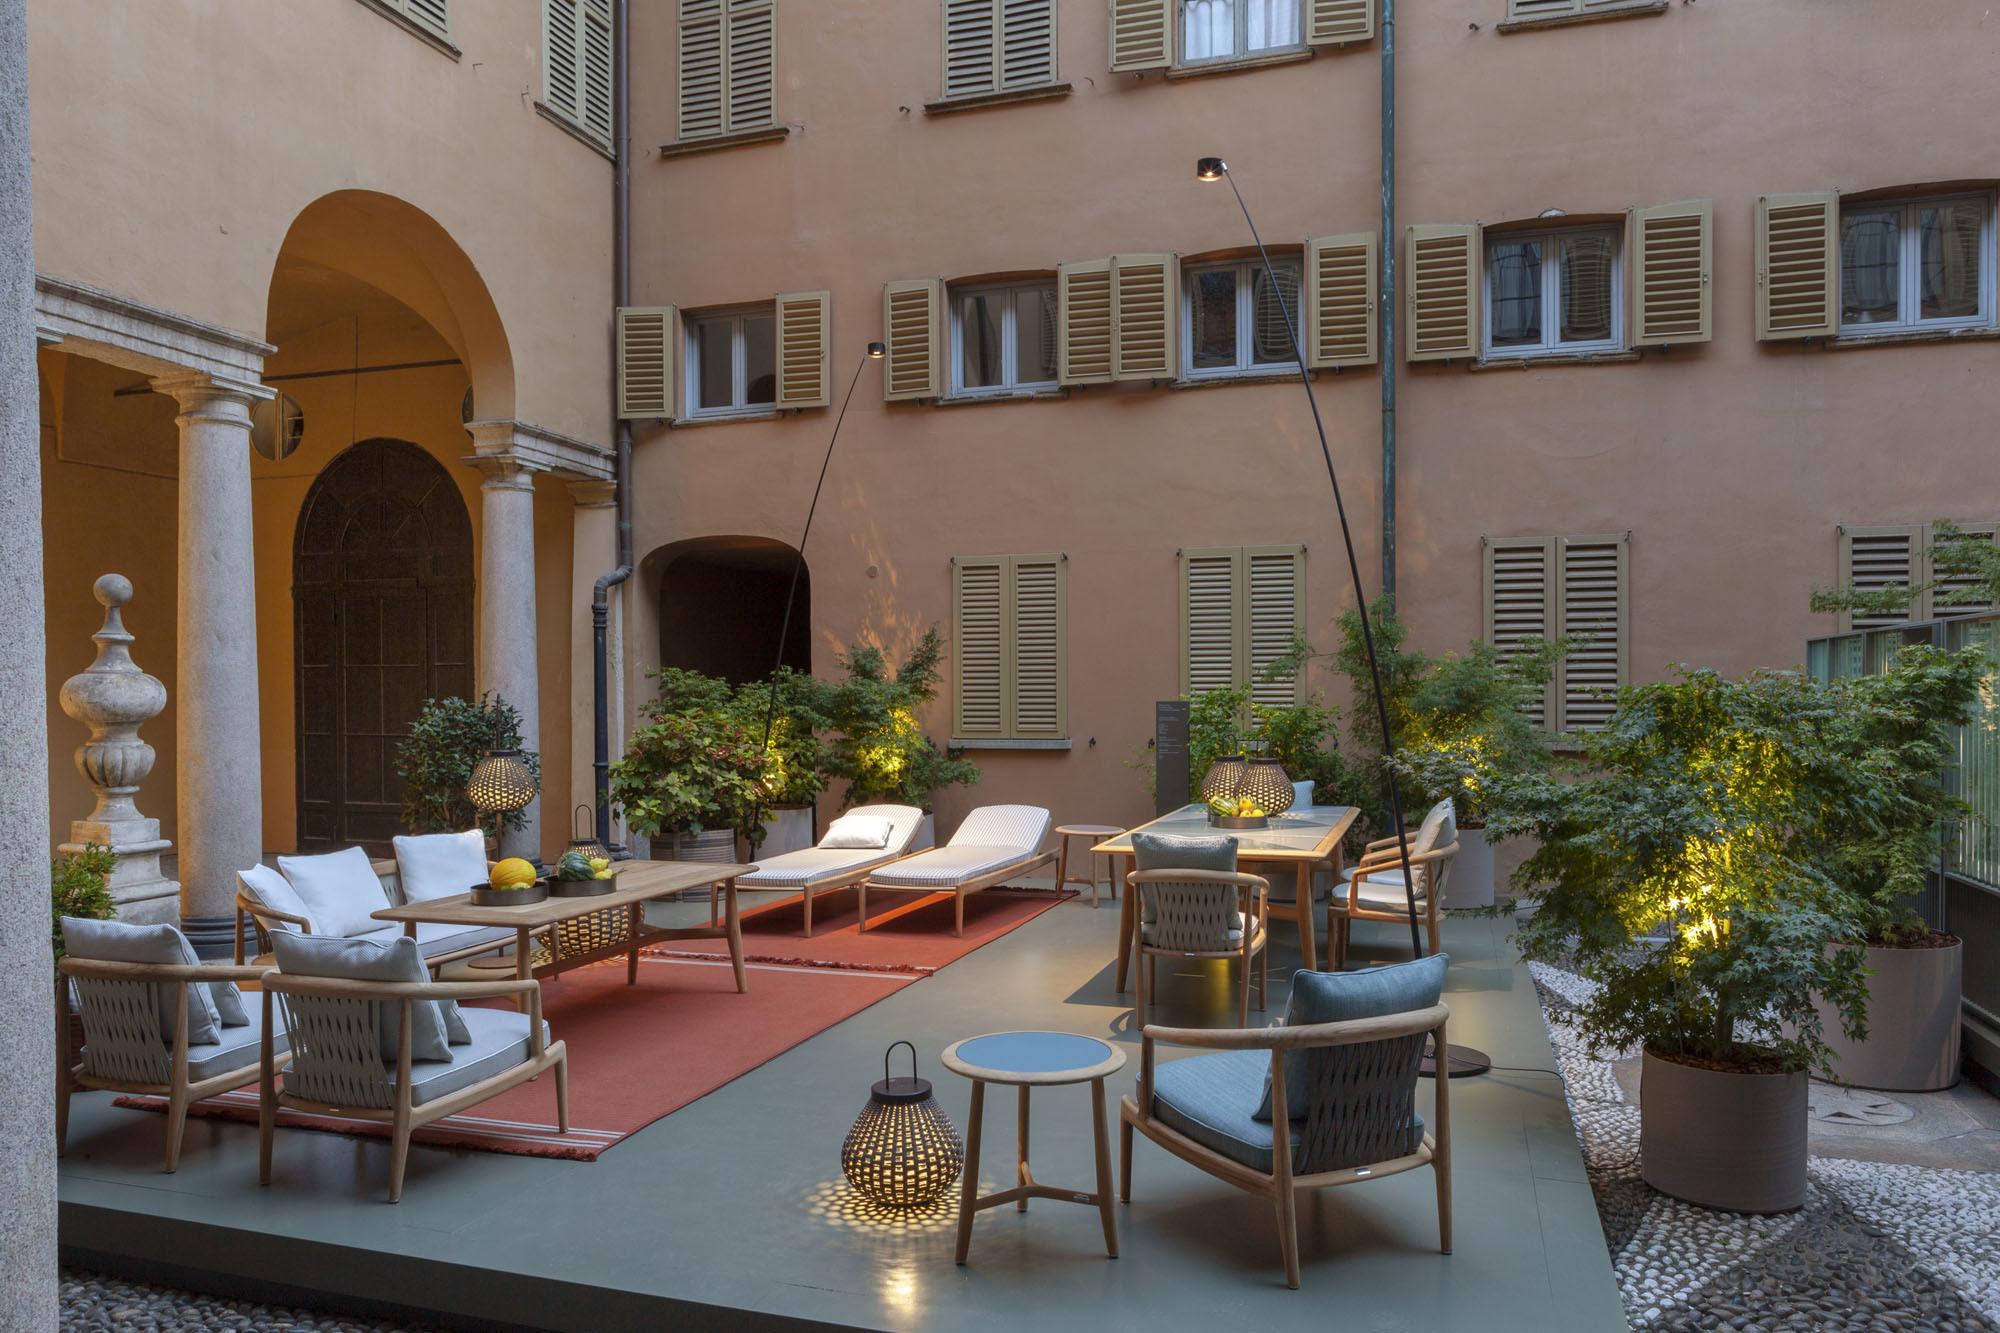 Präsentation von Poltrona Frau im Palazzo Gallarati Scotti an der Via Manzoni. Foto: Poltrona Frau